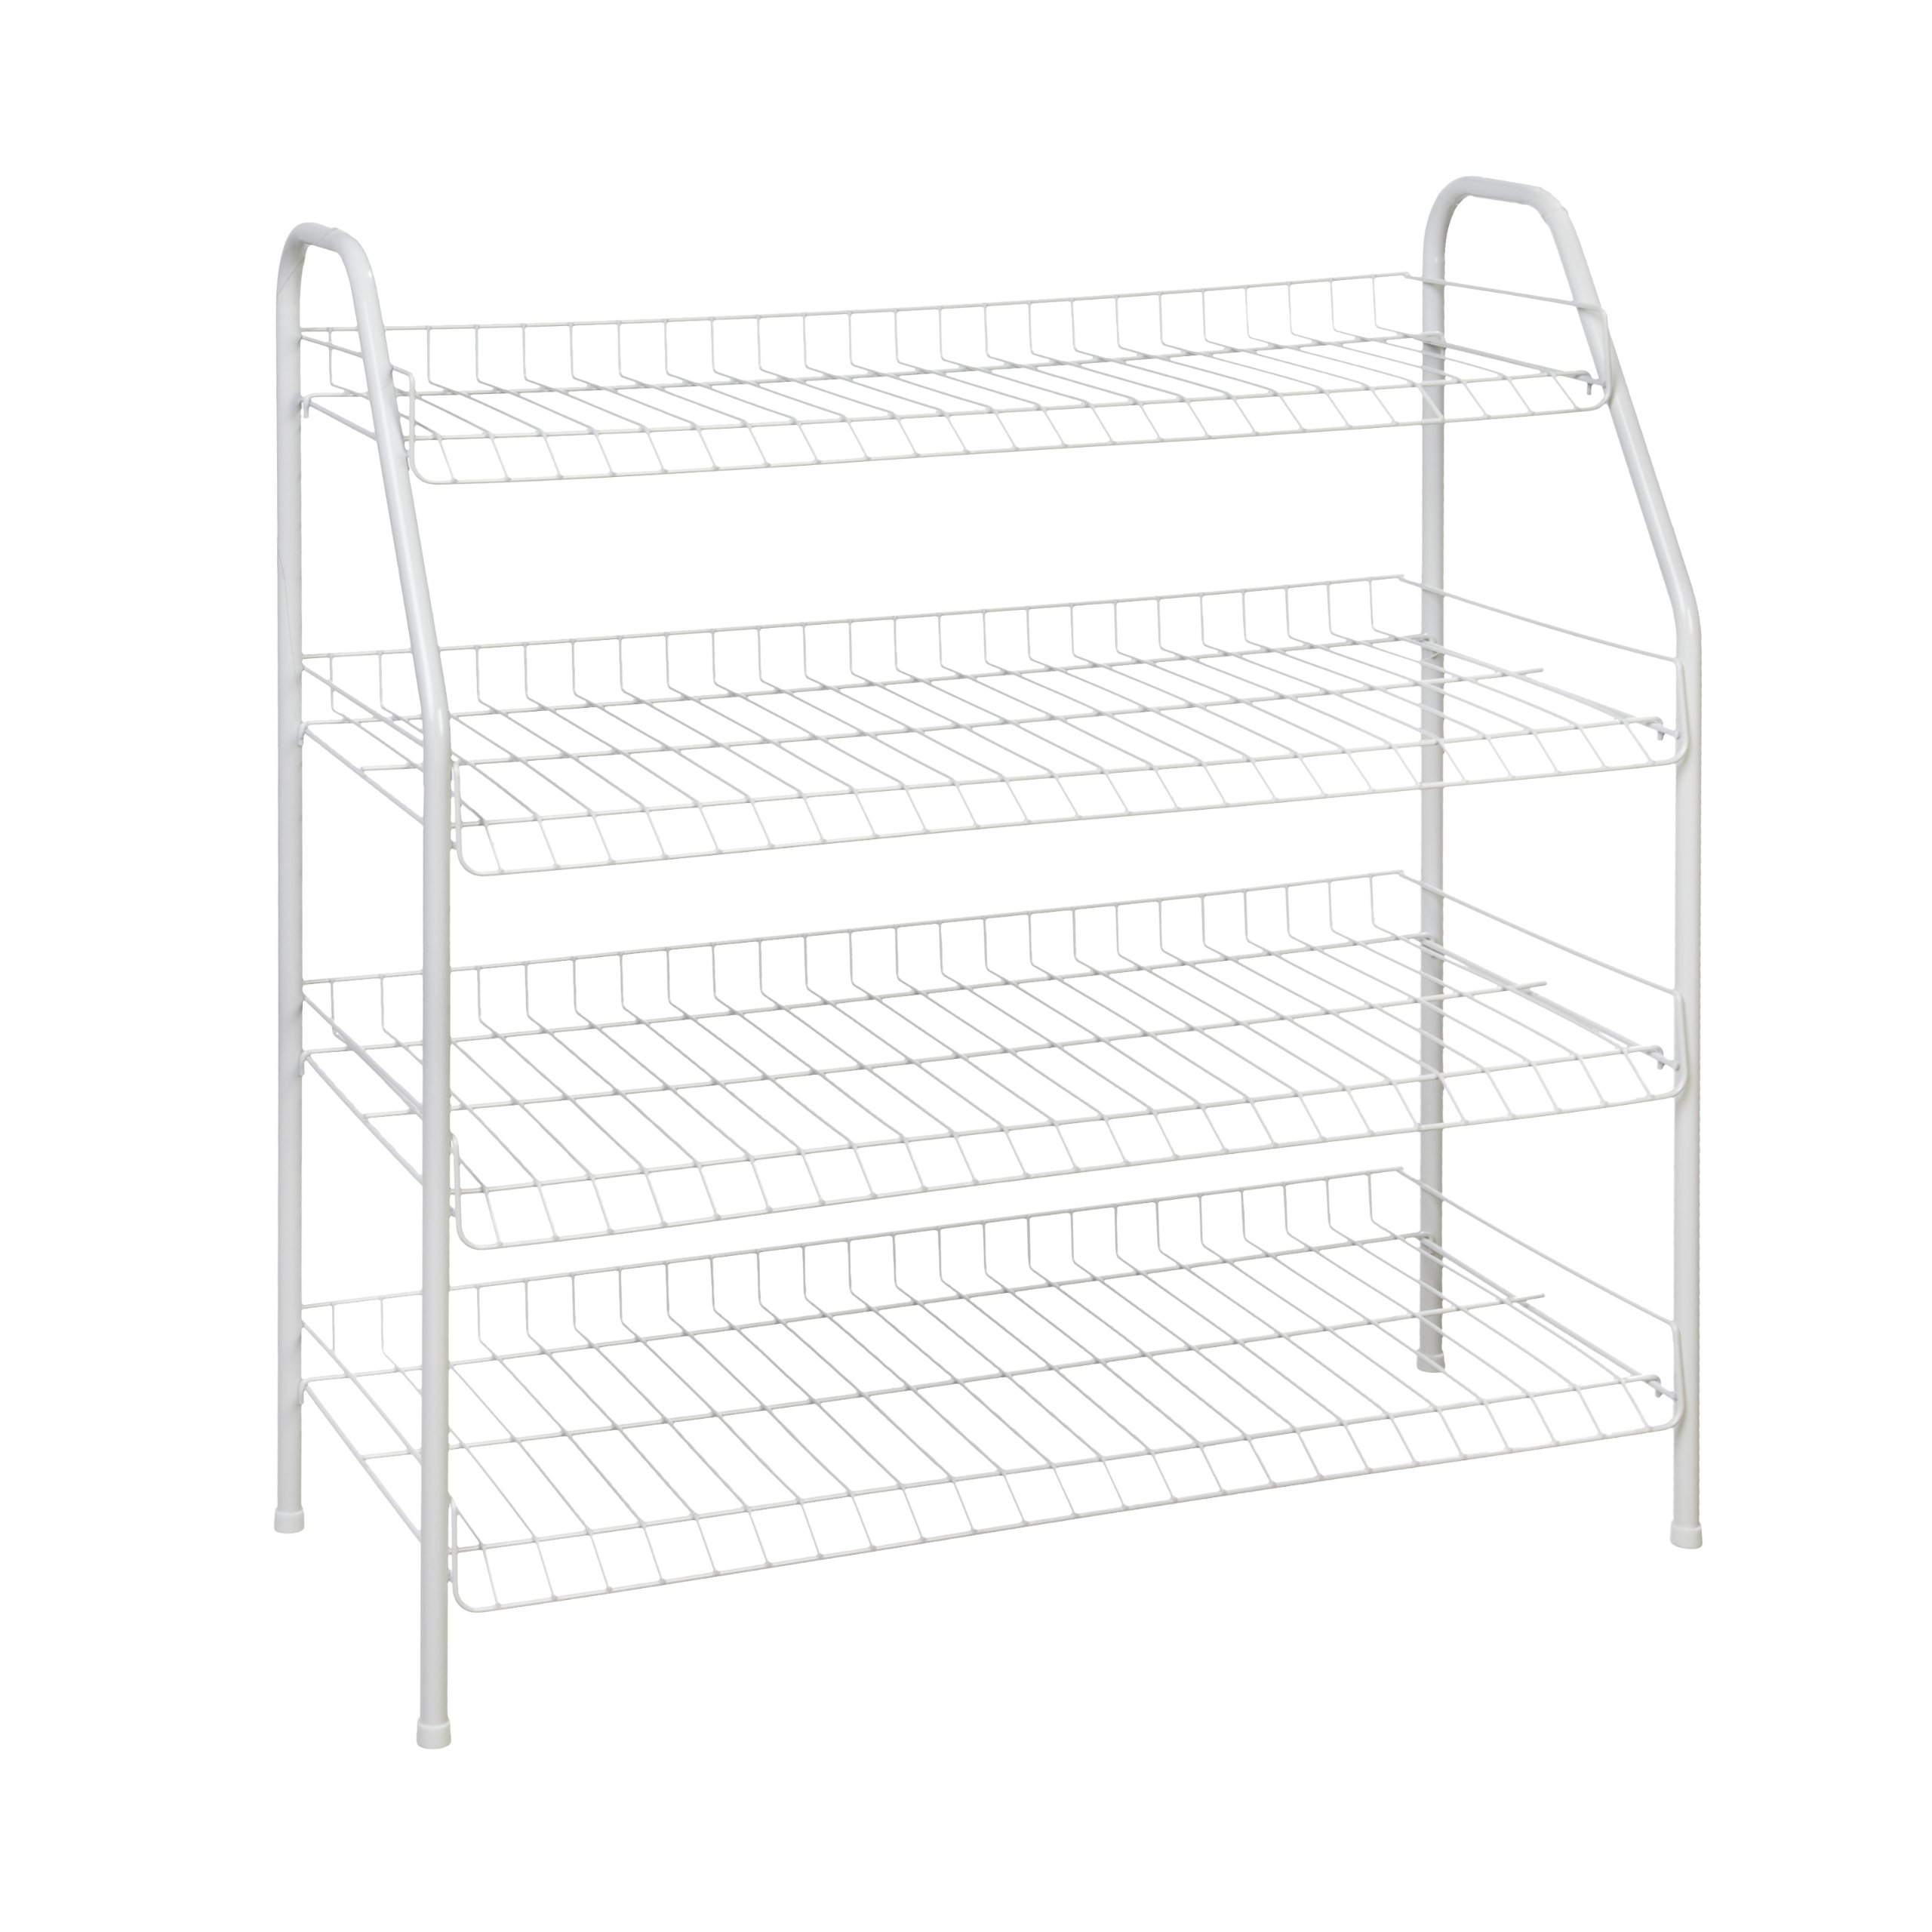 Get Quotations · ClosetMaid 8131 4 Tier Freestanding Shoe Rack, White